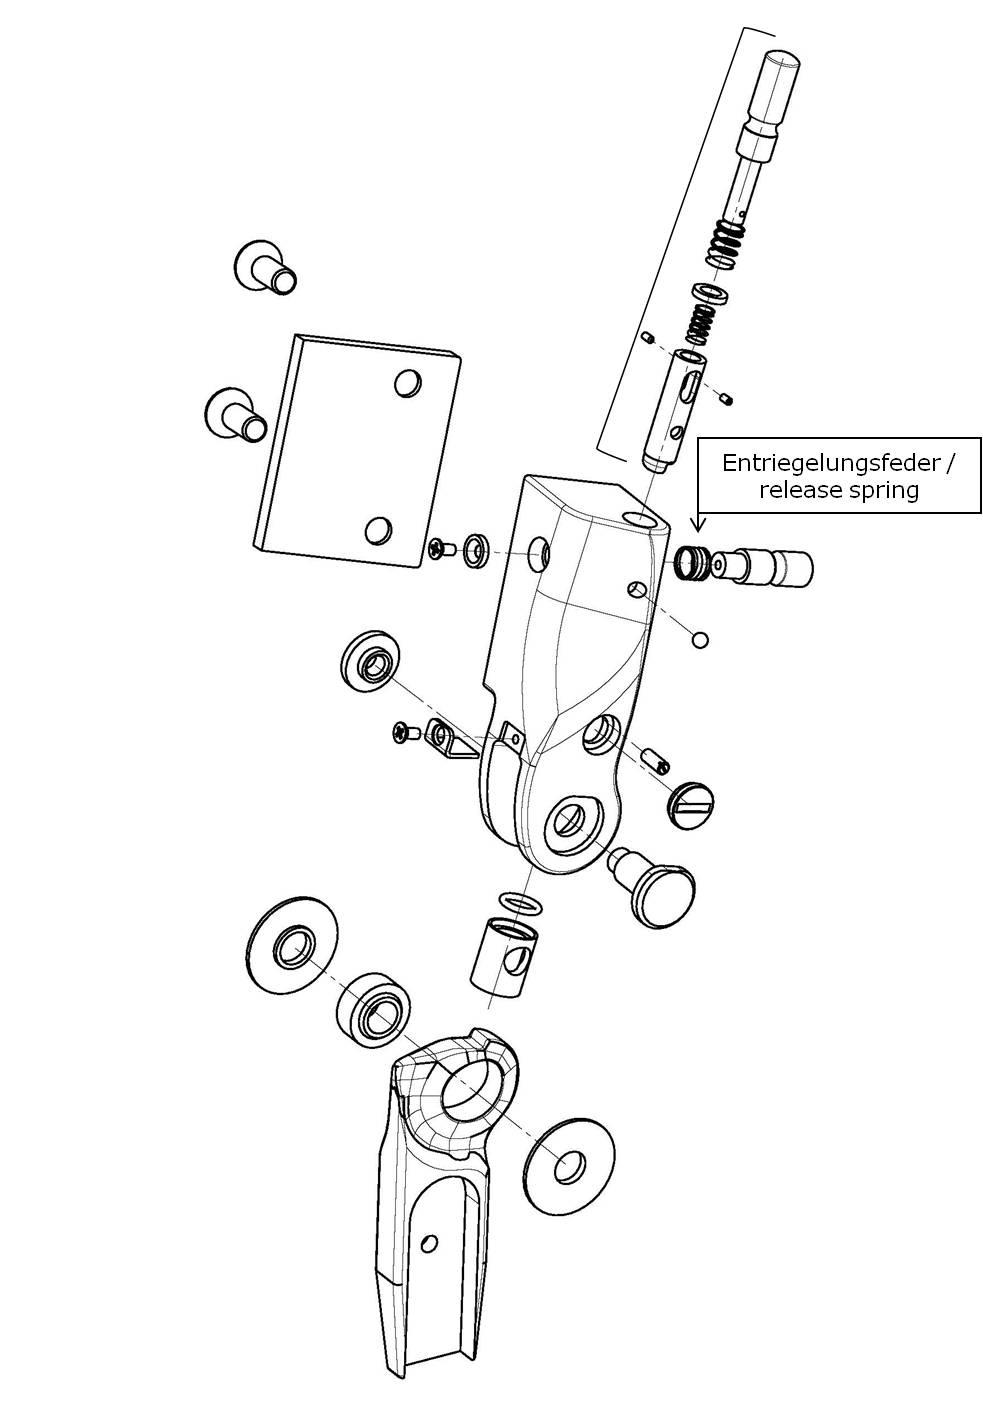 Entriegelungsfeder für das Salera preselect 3-D Hüftgelenk